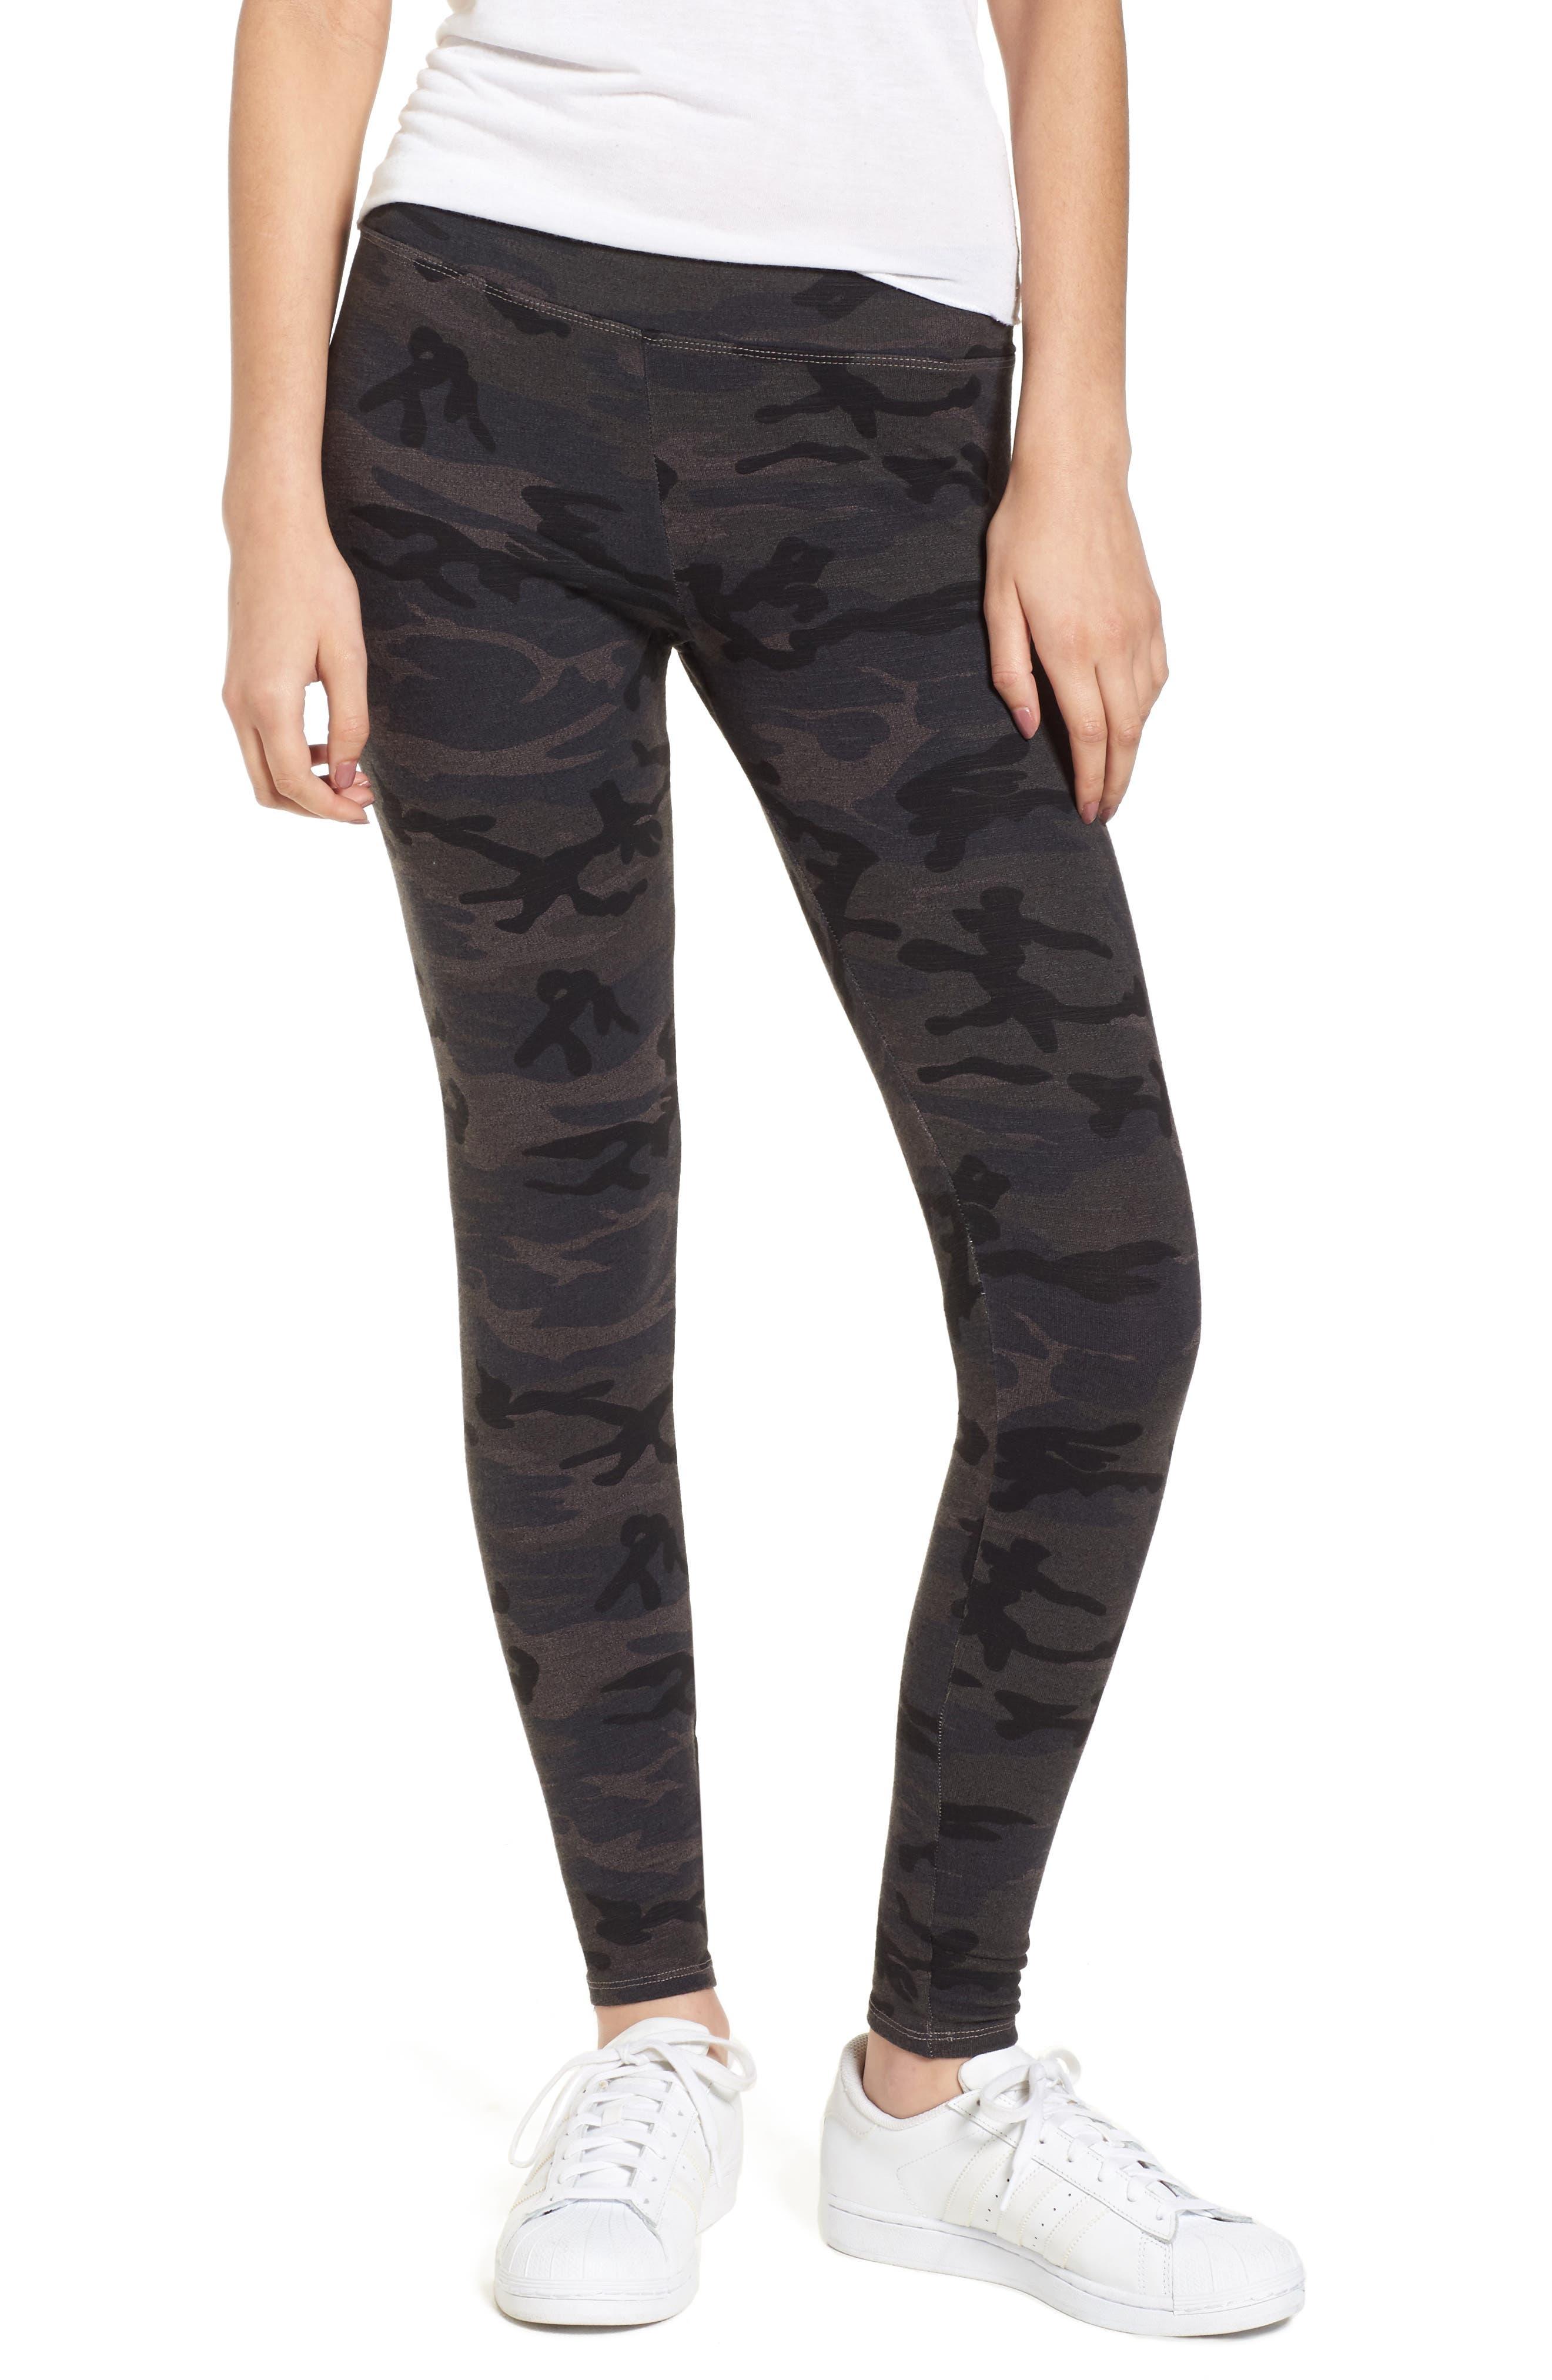 Camo Yoga Pants,                         Main,                         color, Charcoal